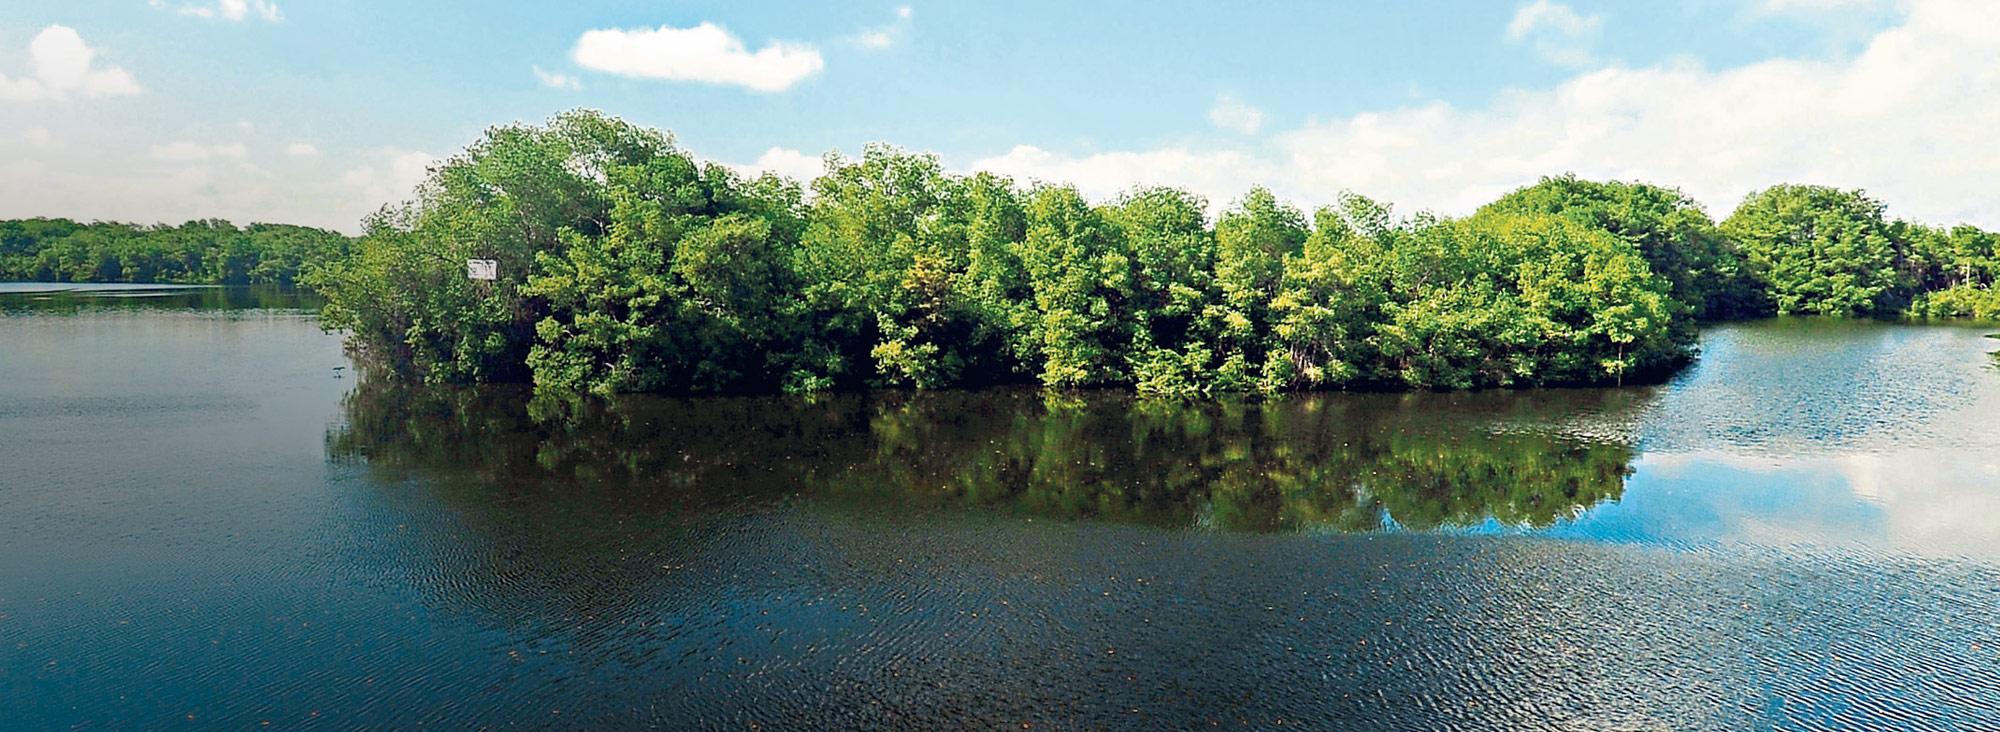 manglares, una barrera